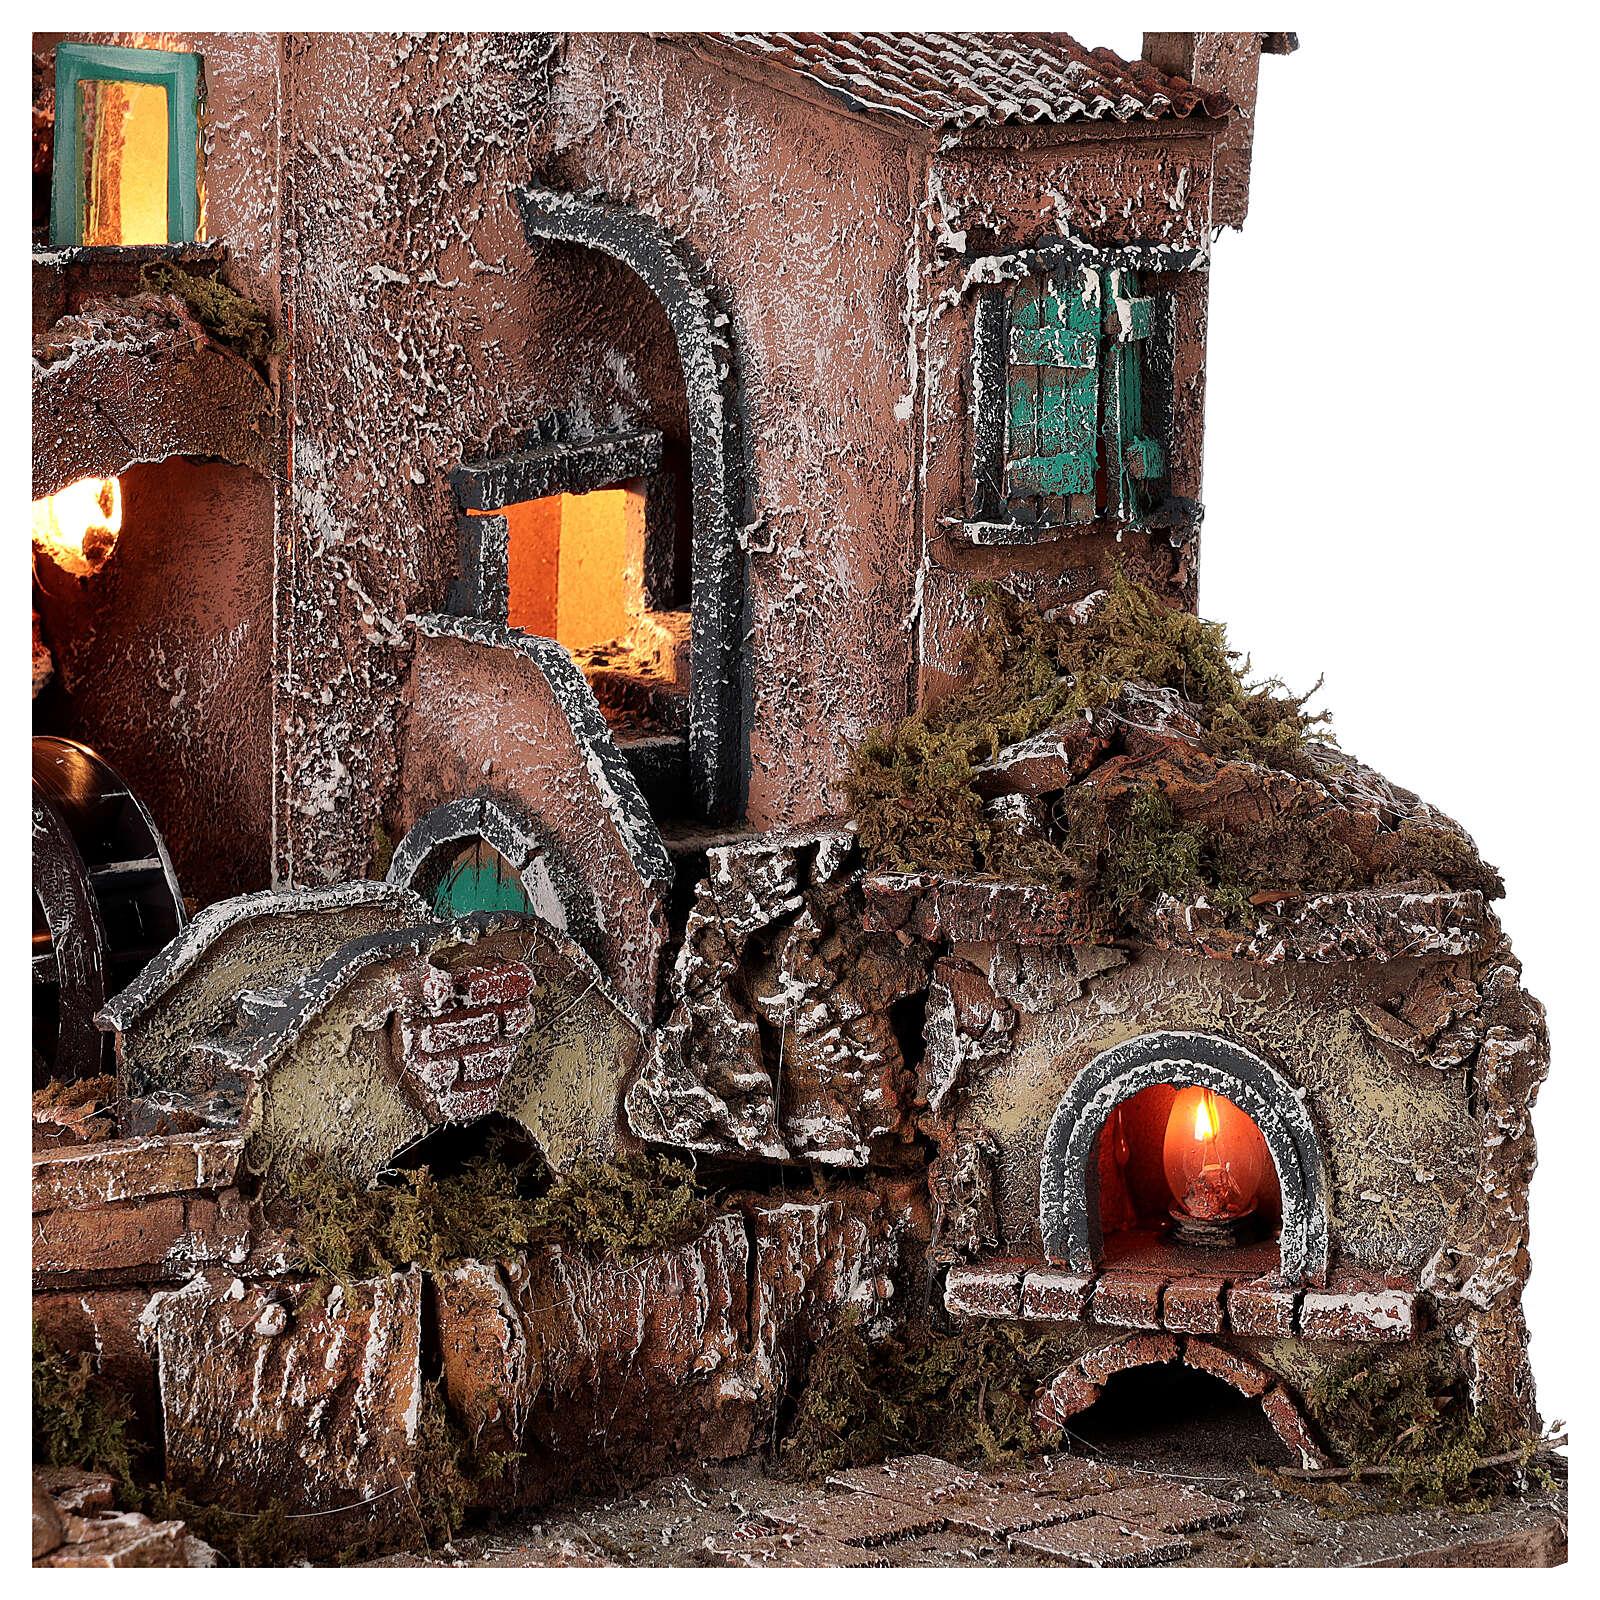 Rustic village set 1700s mill oven bridge 8-10 cm Neapolitan nativity 40x50x40 cm 4